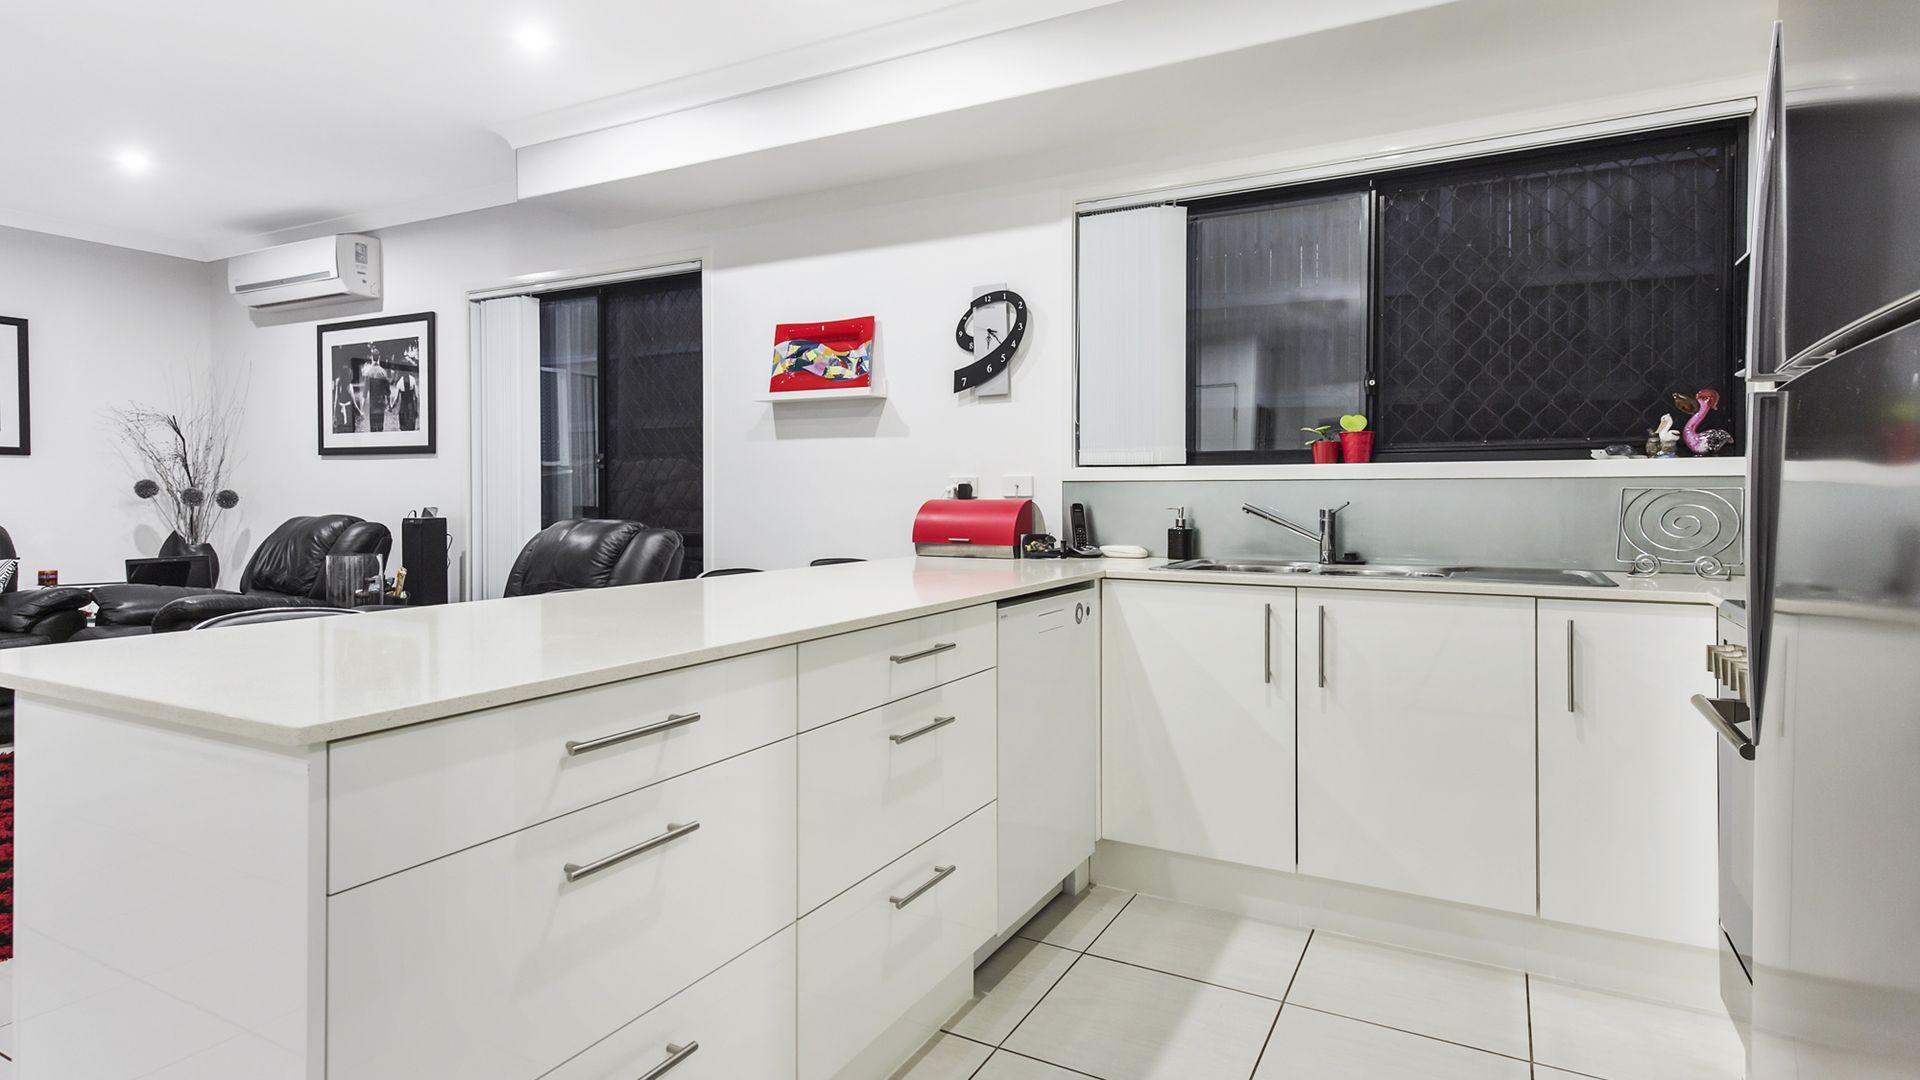 3/16 Hester Street, Shailer Park QLD 4128, Image 2